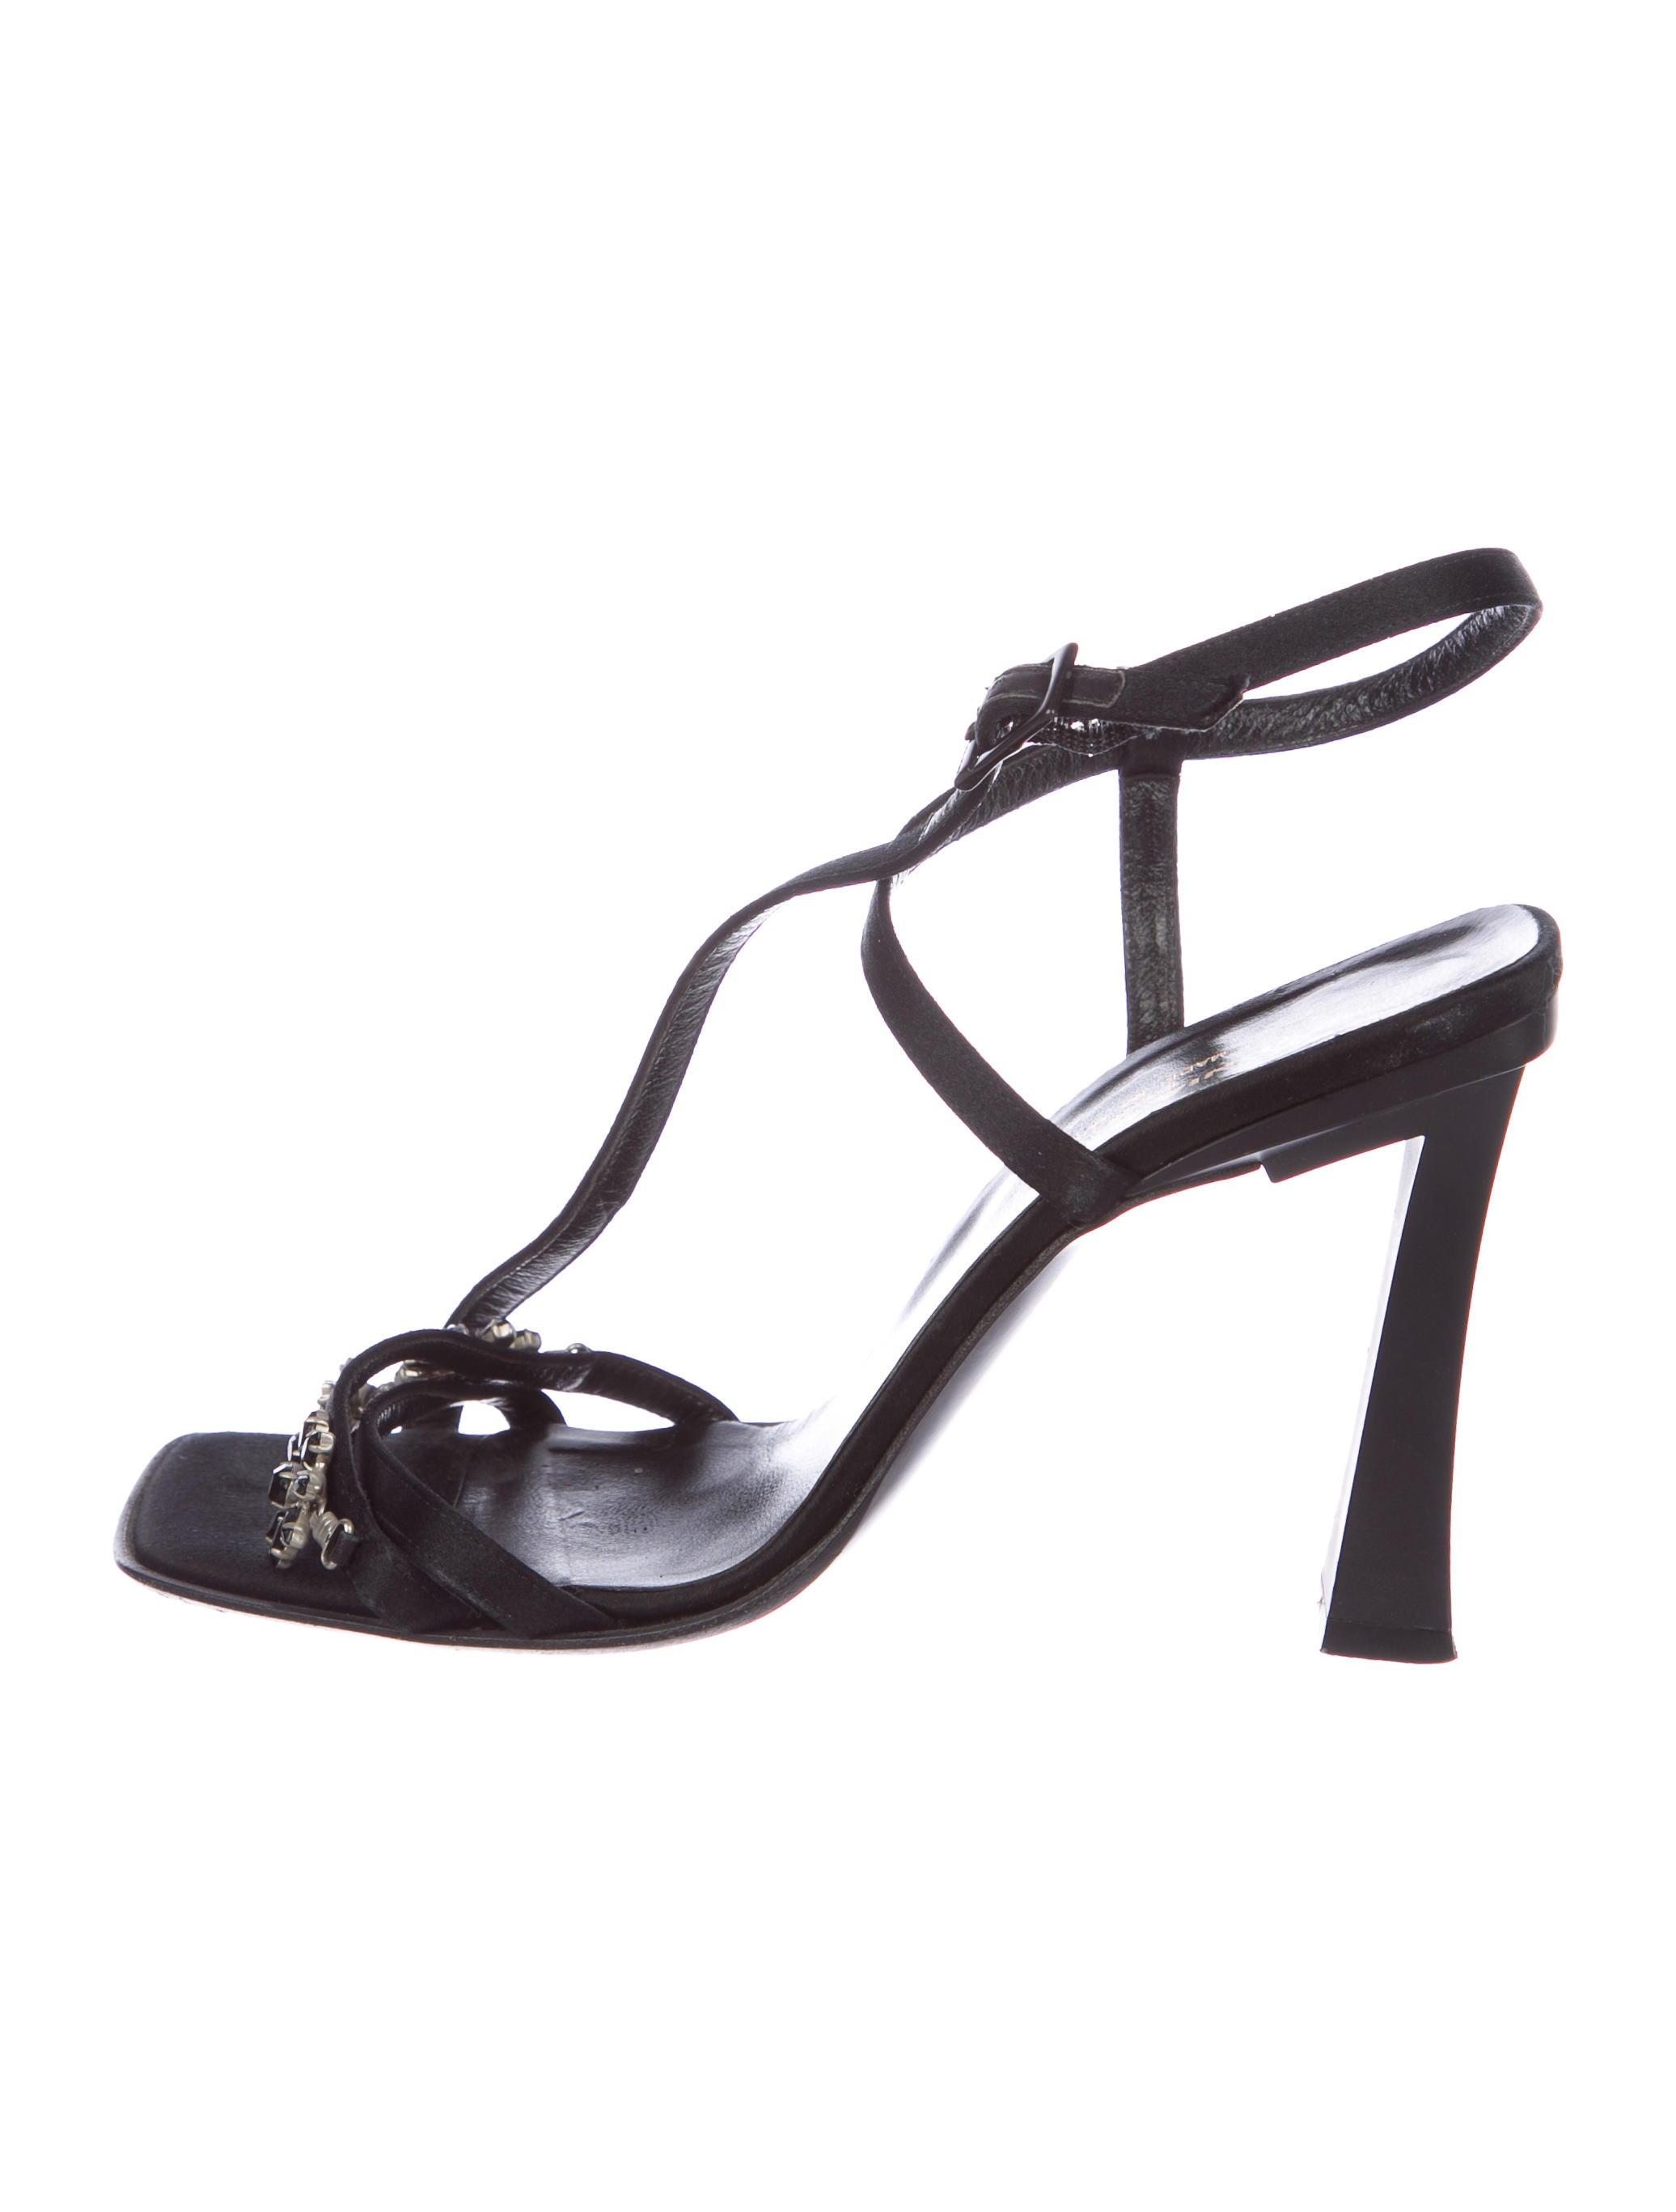 Sonia Rykiel Vintage Satin Sandals best online discount genuine cheap limited edition cheap enjoy discount wide range of Ux56qa1E0K